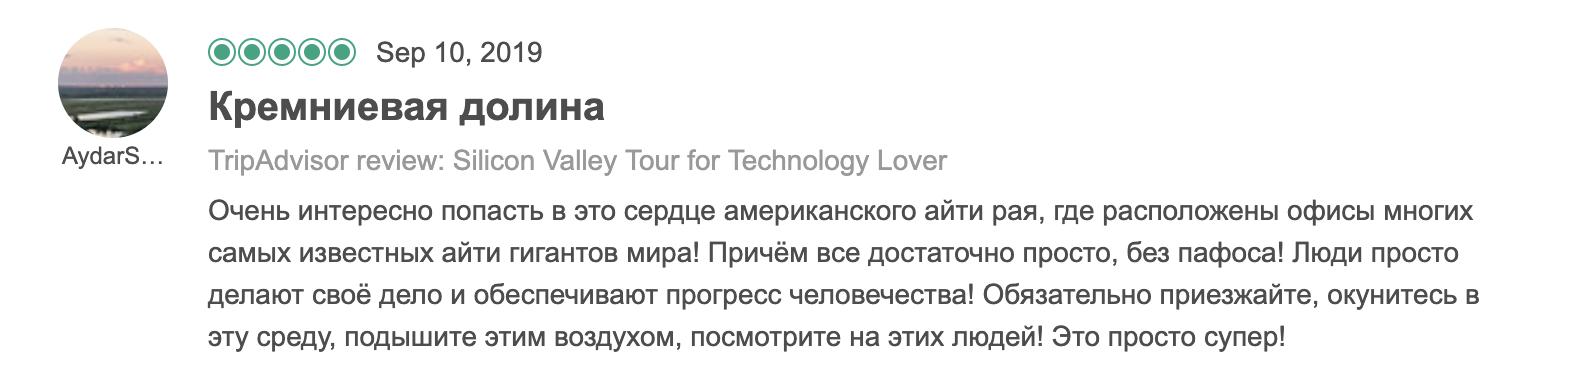 One day Silicon Valley Tour 2